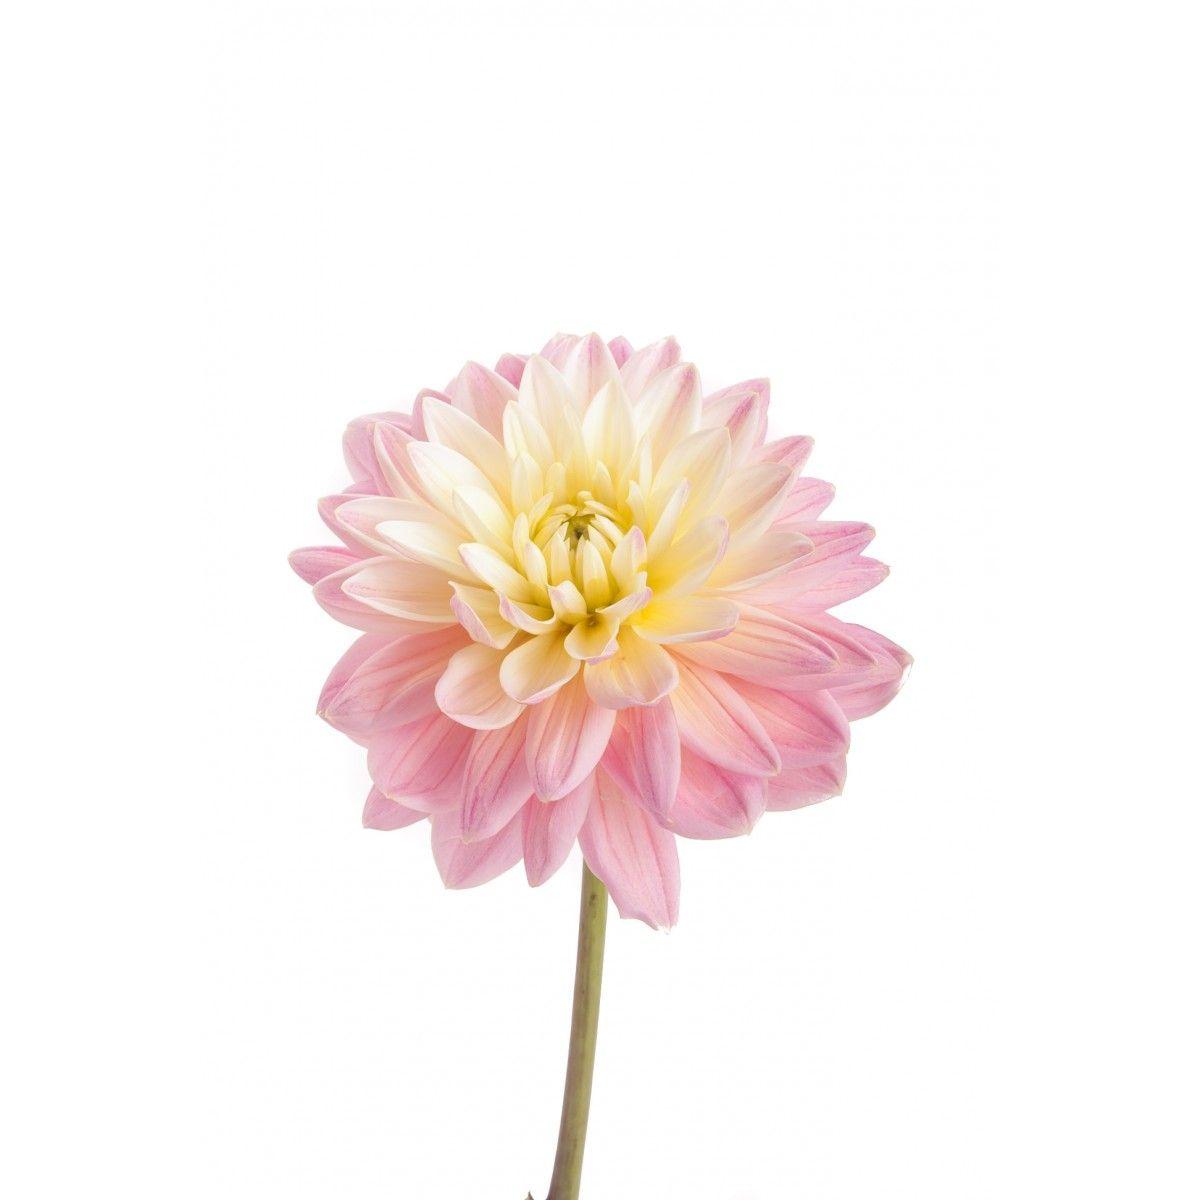 Cream and light pink dahlia flowers 2017 flower varieties eda cream and light pink dahlia flowers izmirmasajfo